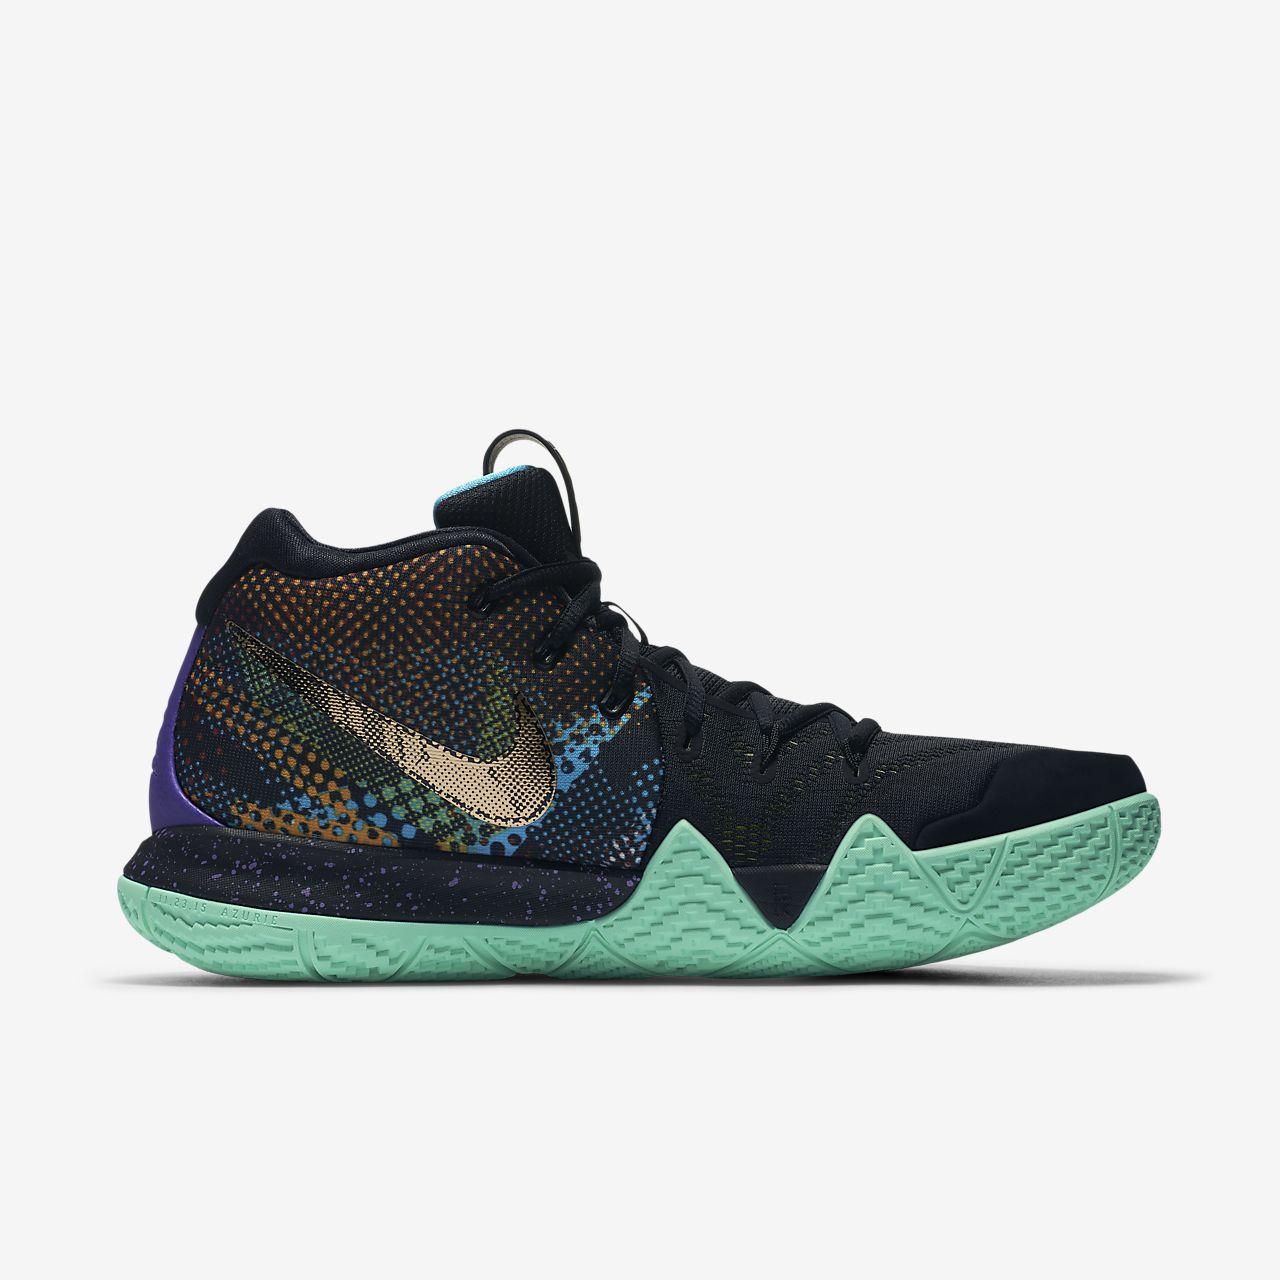 ... Kyrie 4 Men's Basketball Shoe